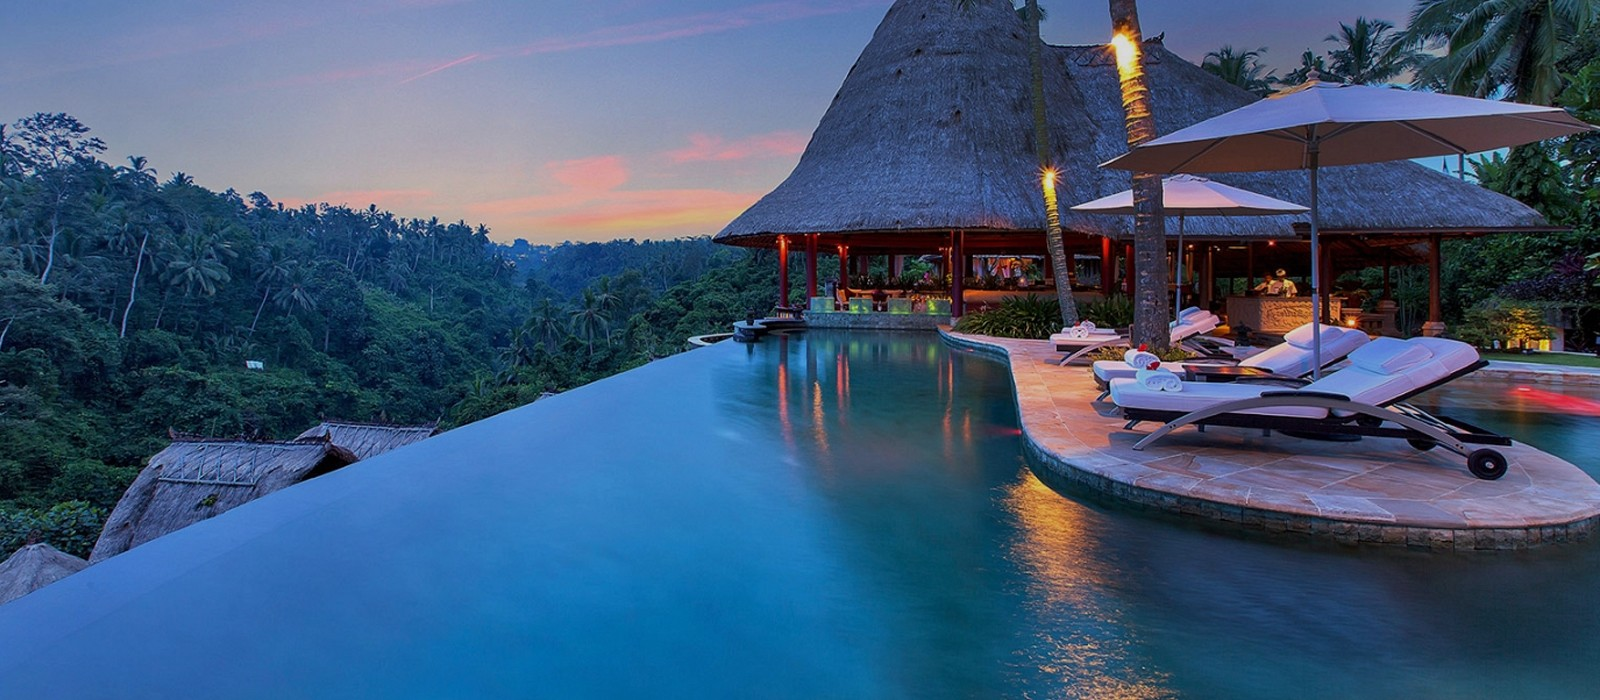 Viceroy bali bali honeymoon packages honeymoon dreams for Five star hotels in bali indonesia